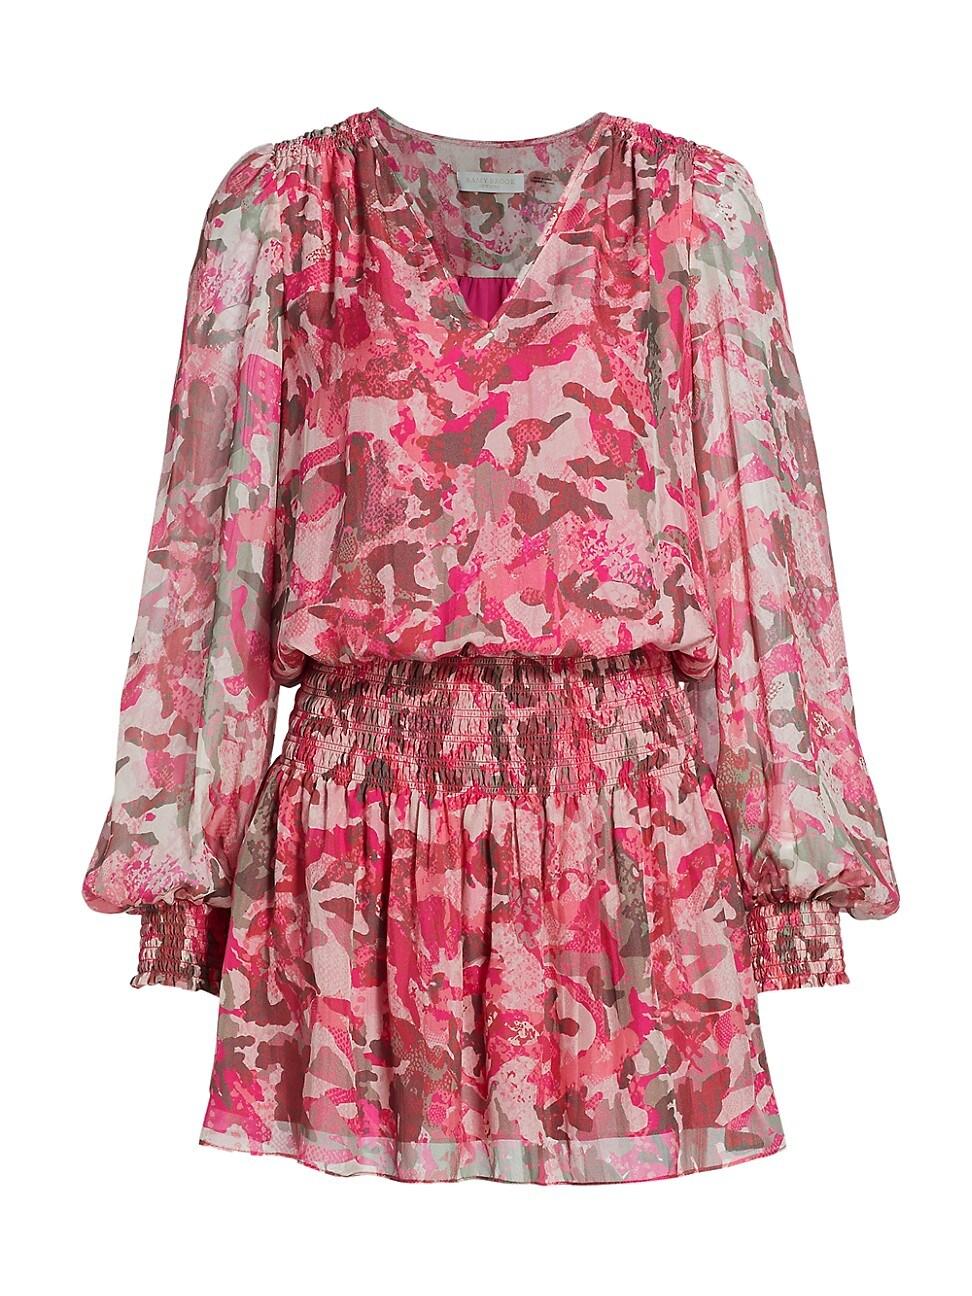 Ramy Brook WOMEN'S PRINTED SHAW MINI DRESS